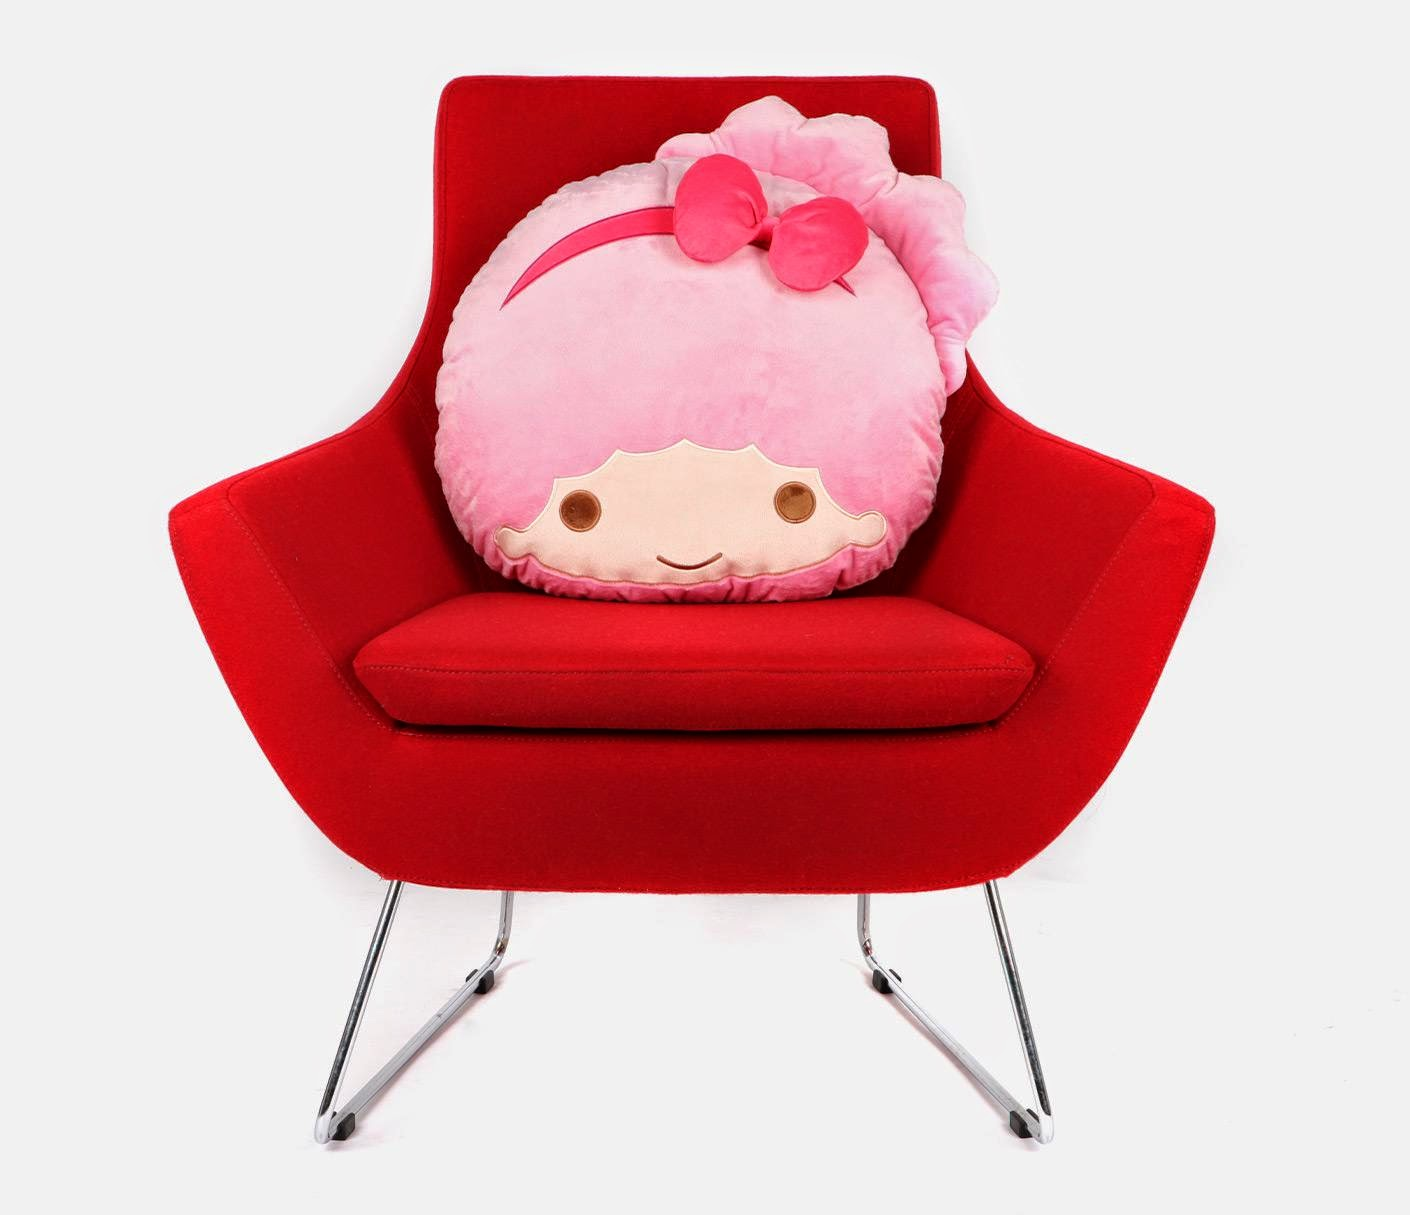 Sanrio character cushions Little Twin Stars: lala